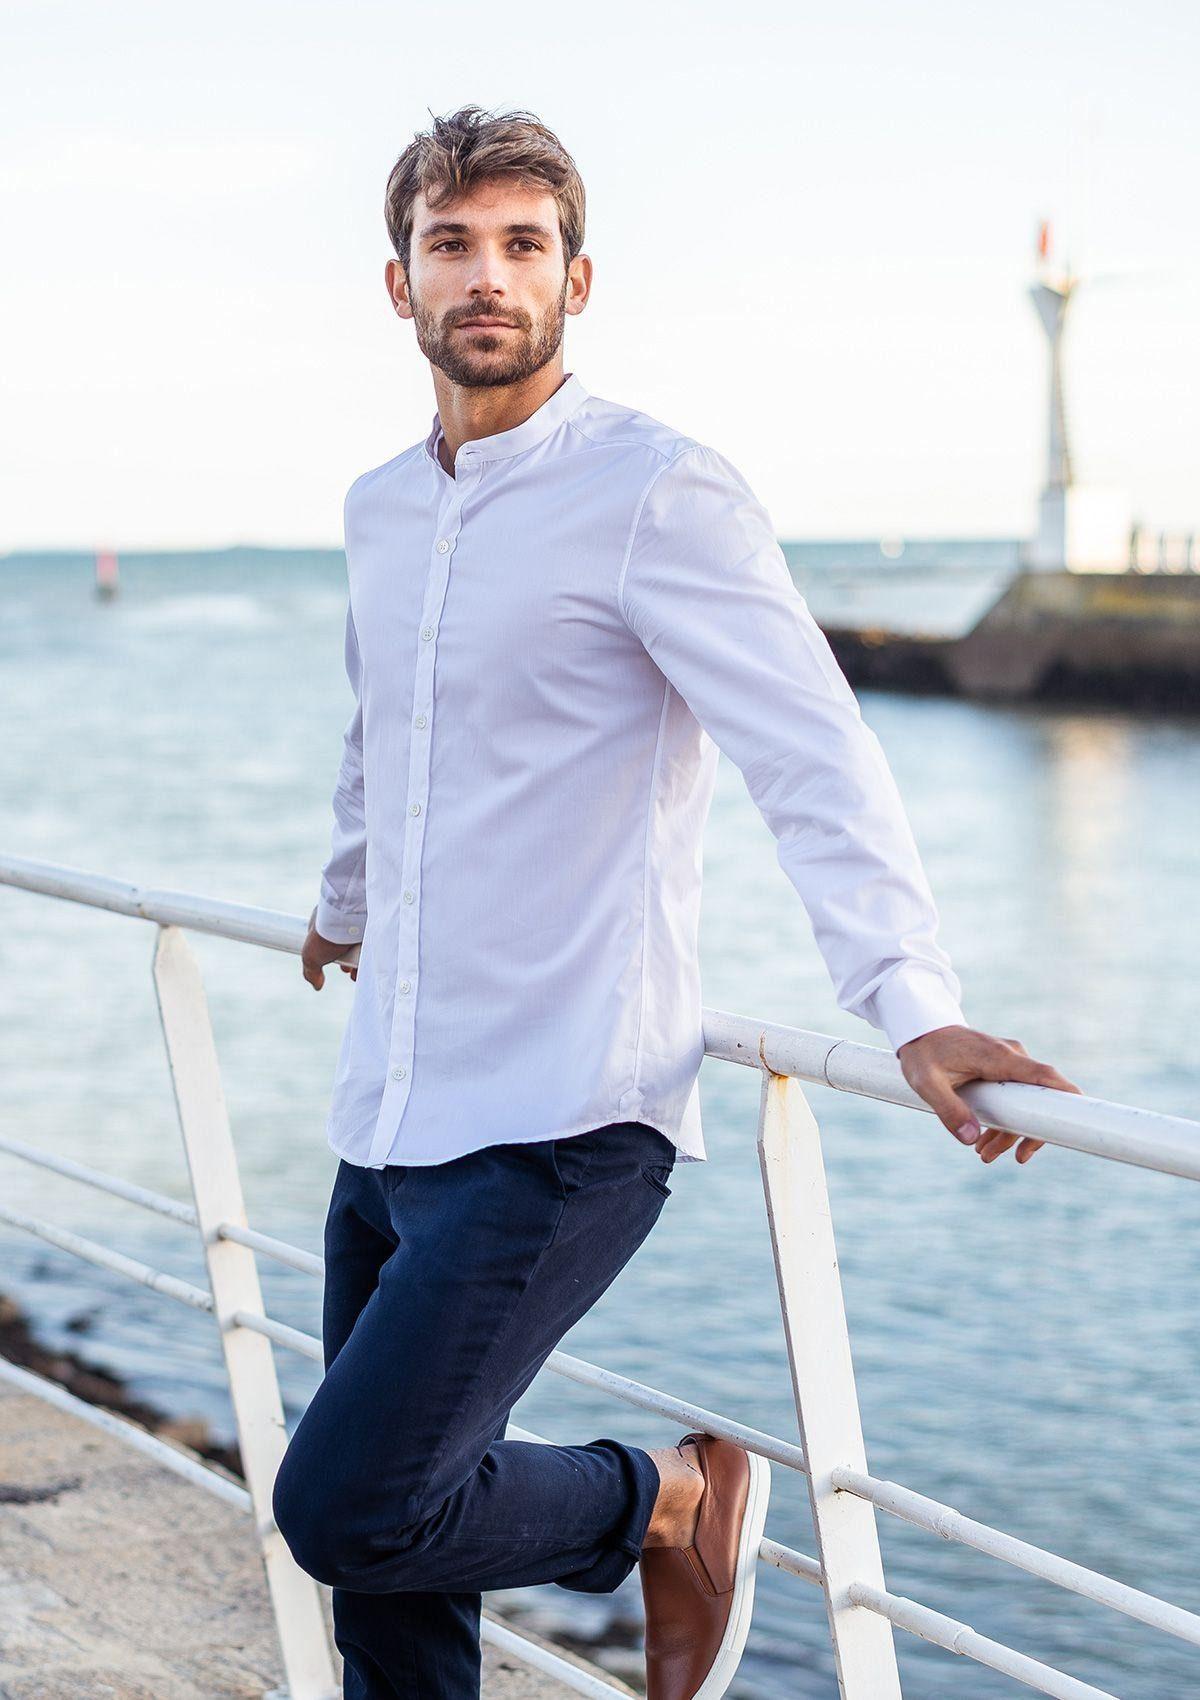 Montlimart chemise blanche homme col mao made in france porté sur mannequin homme dos à la mer